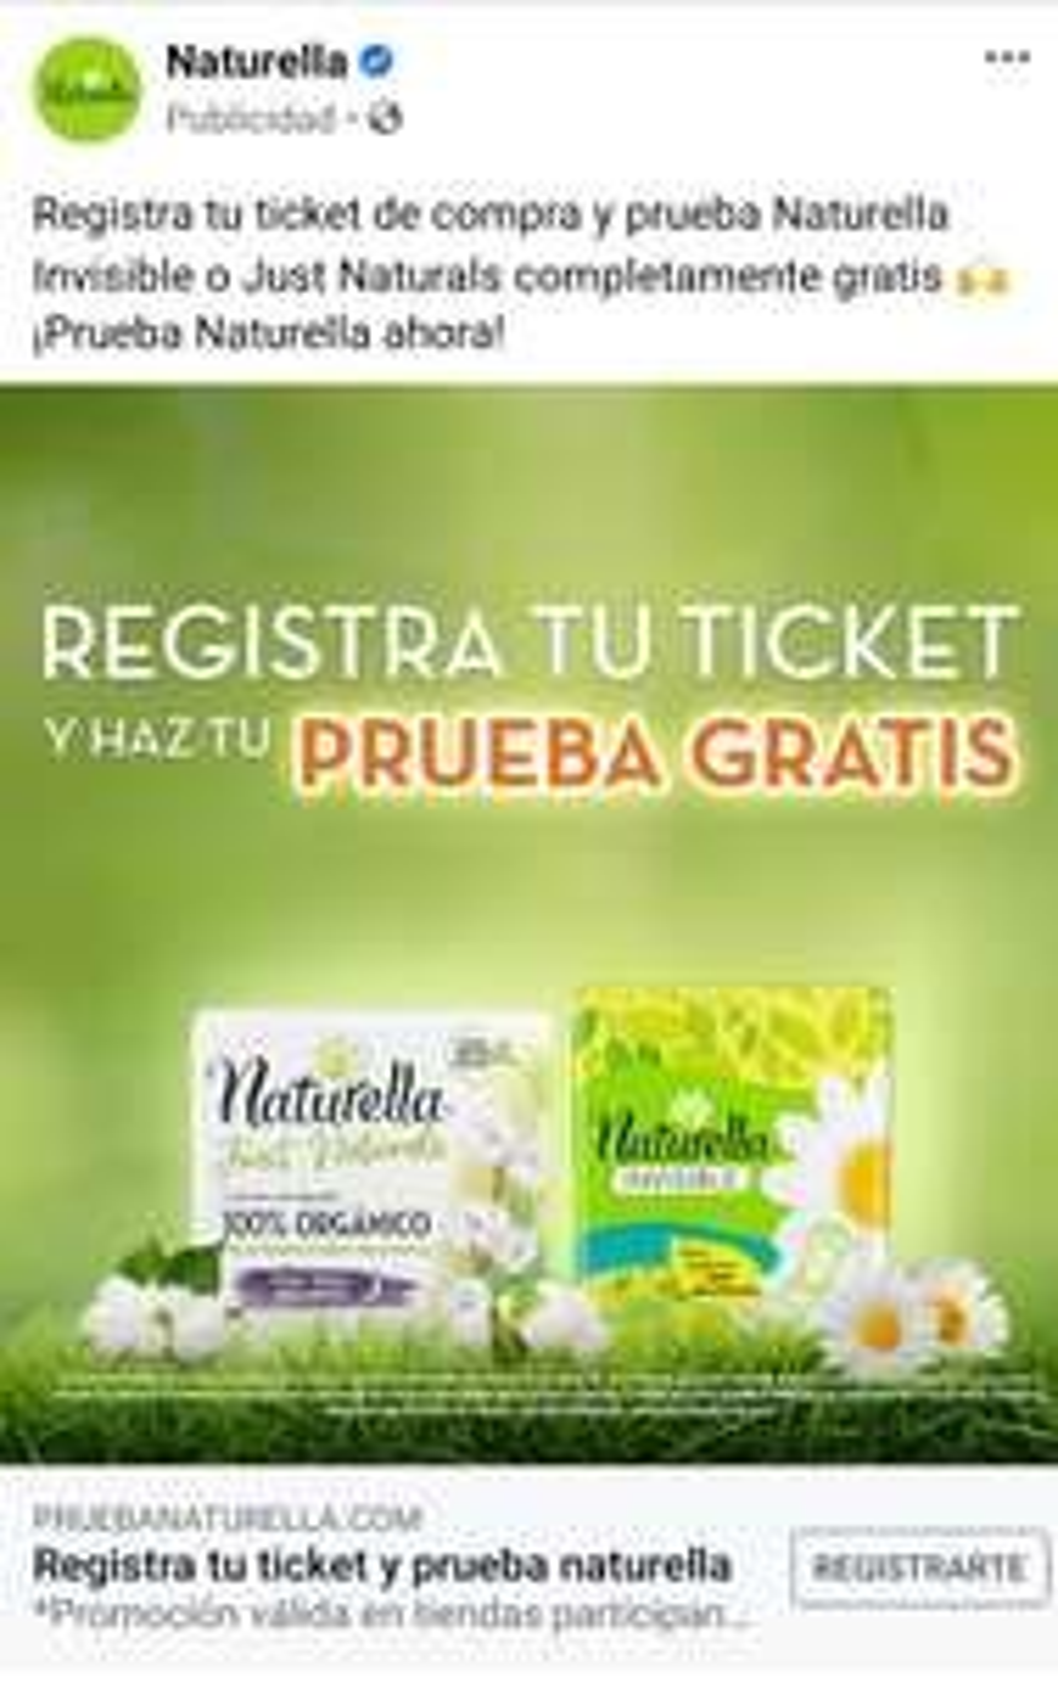 Naturella Invisible o Just Naturals: Registra tu Ticket y recibe un reembolso del producto